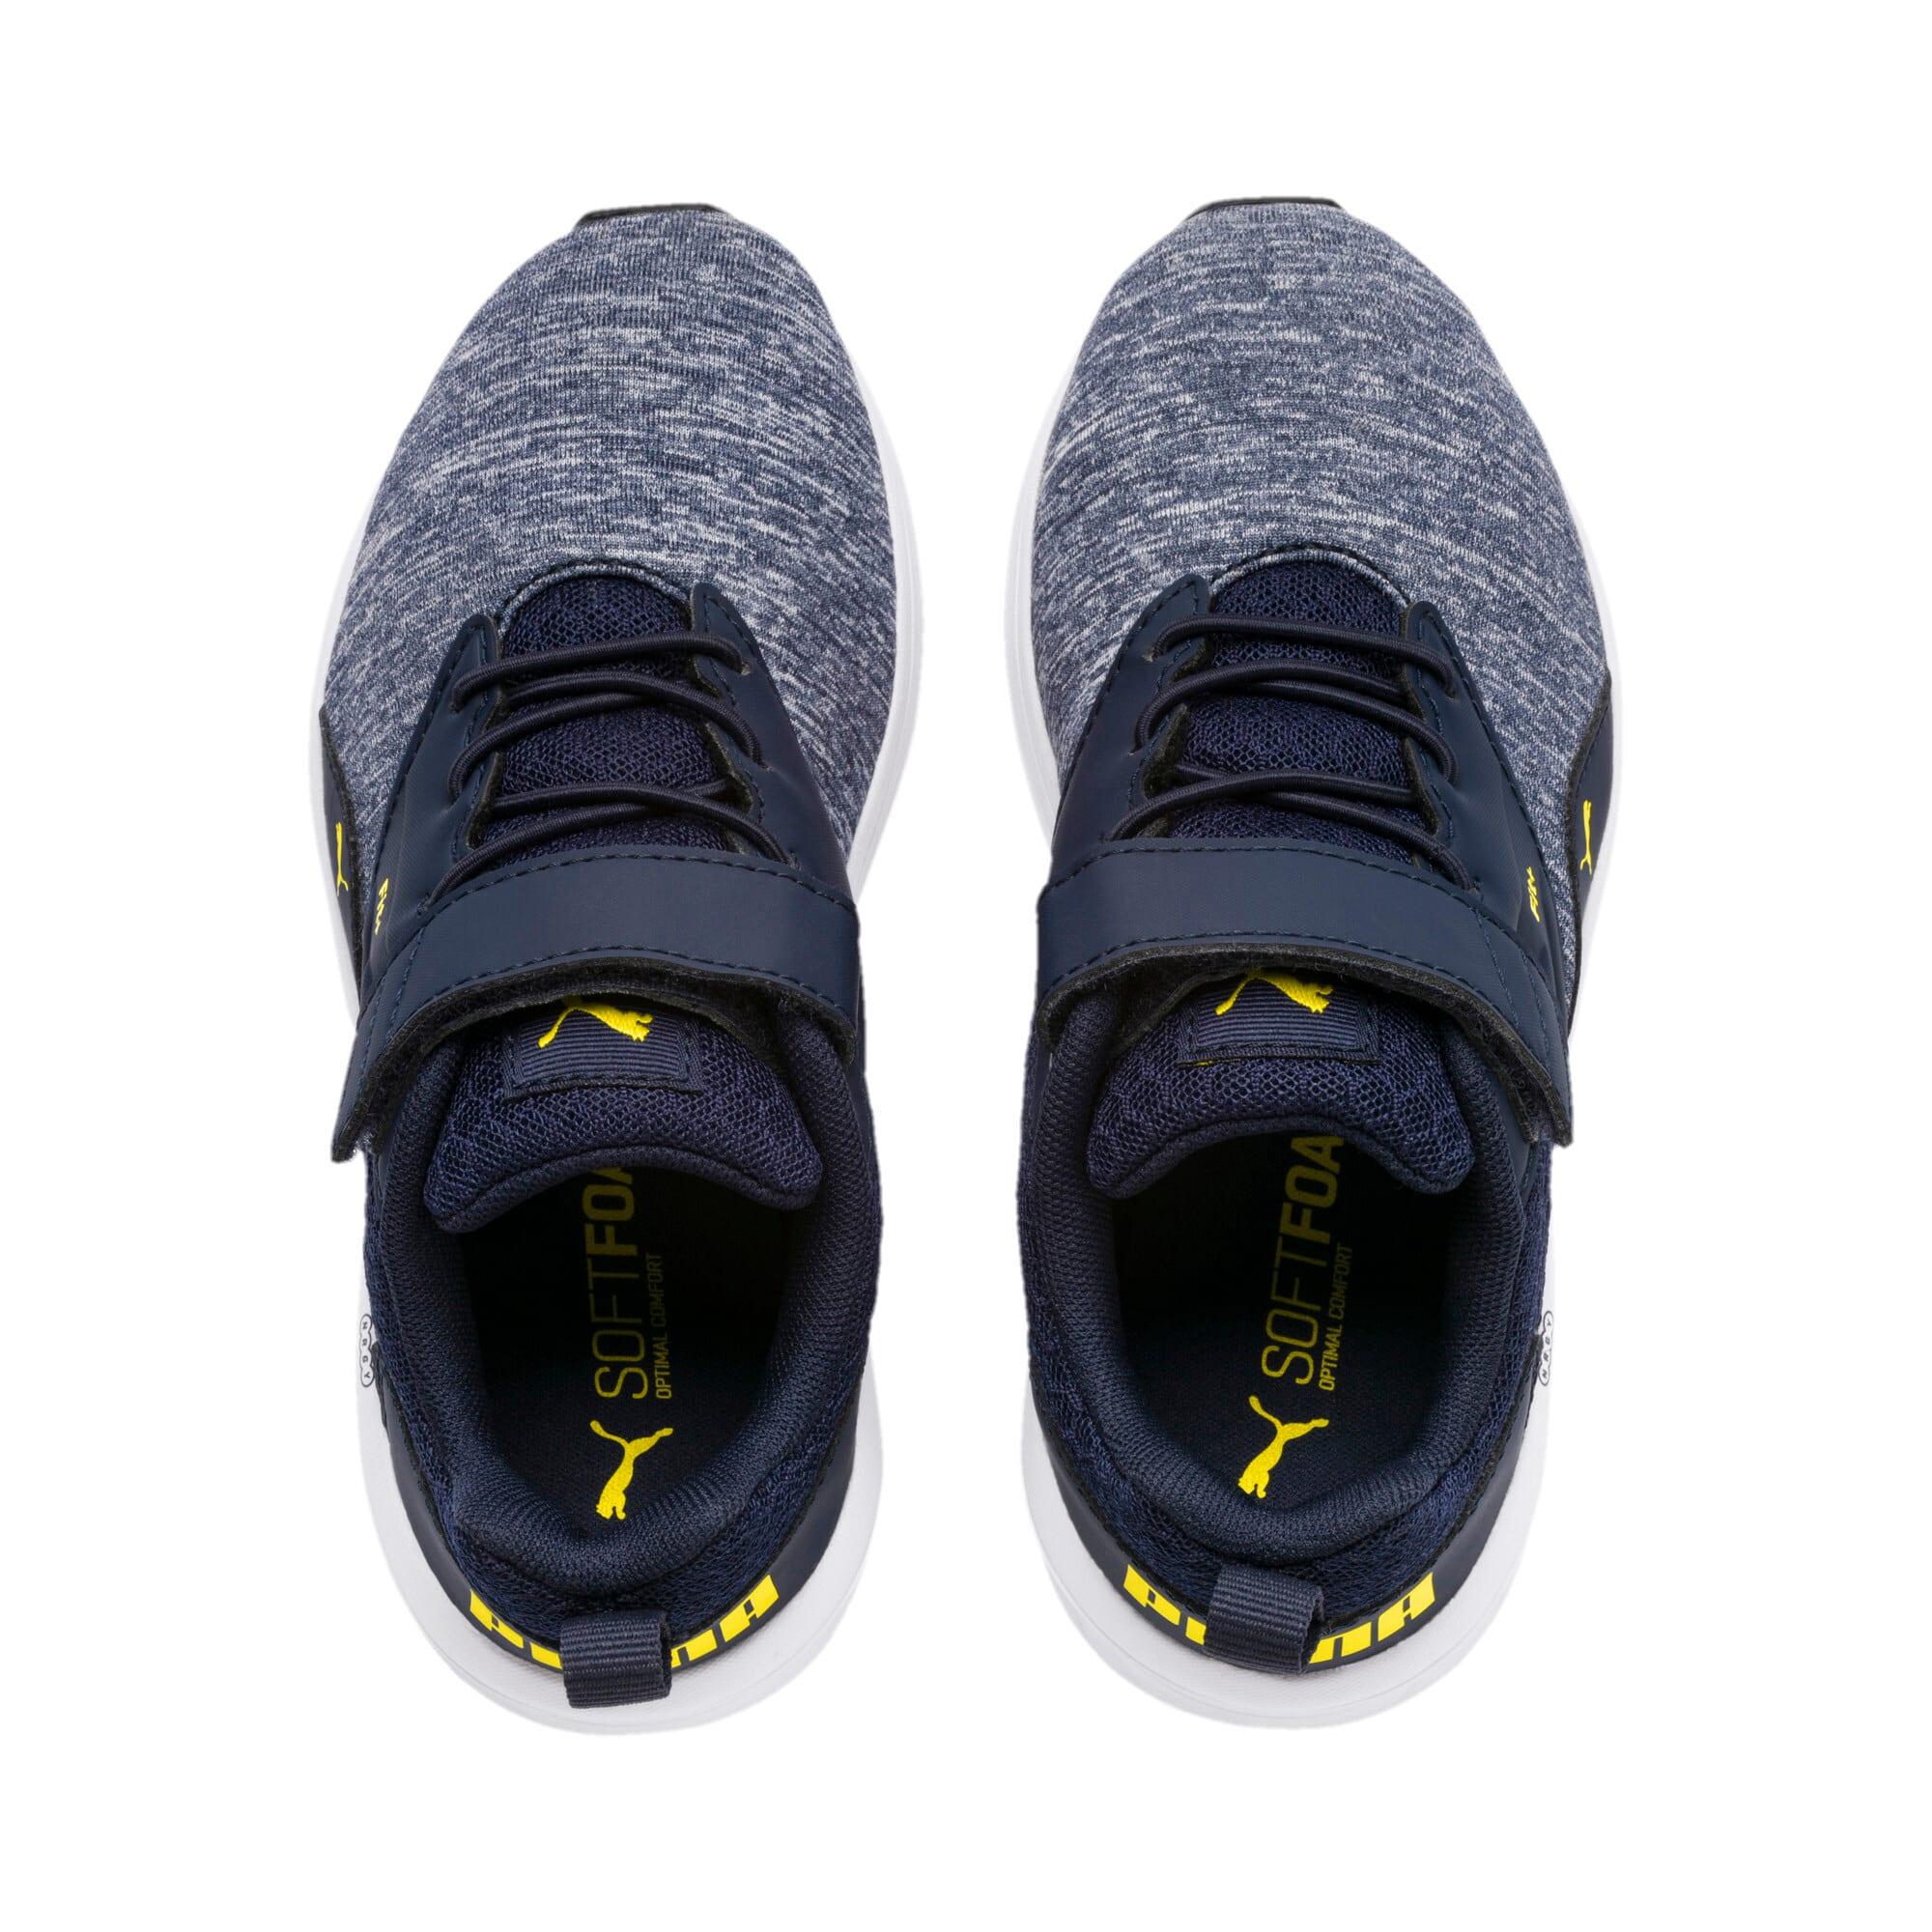 Thumbnail 4 of NRGY Comet Preschool Running Shoes, Peacoat-Blazing Yellow, medium-IND